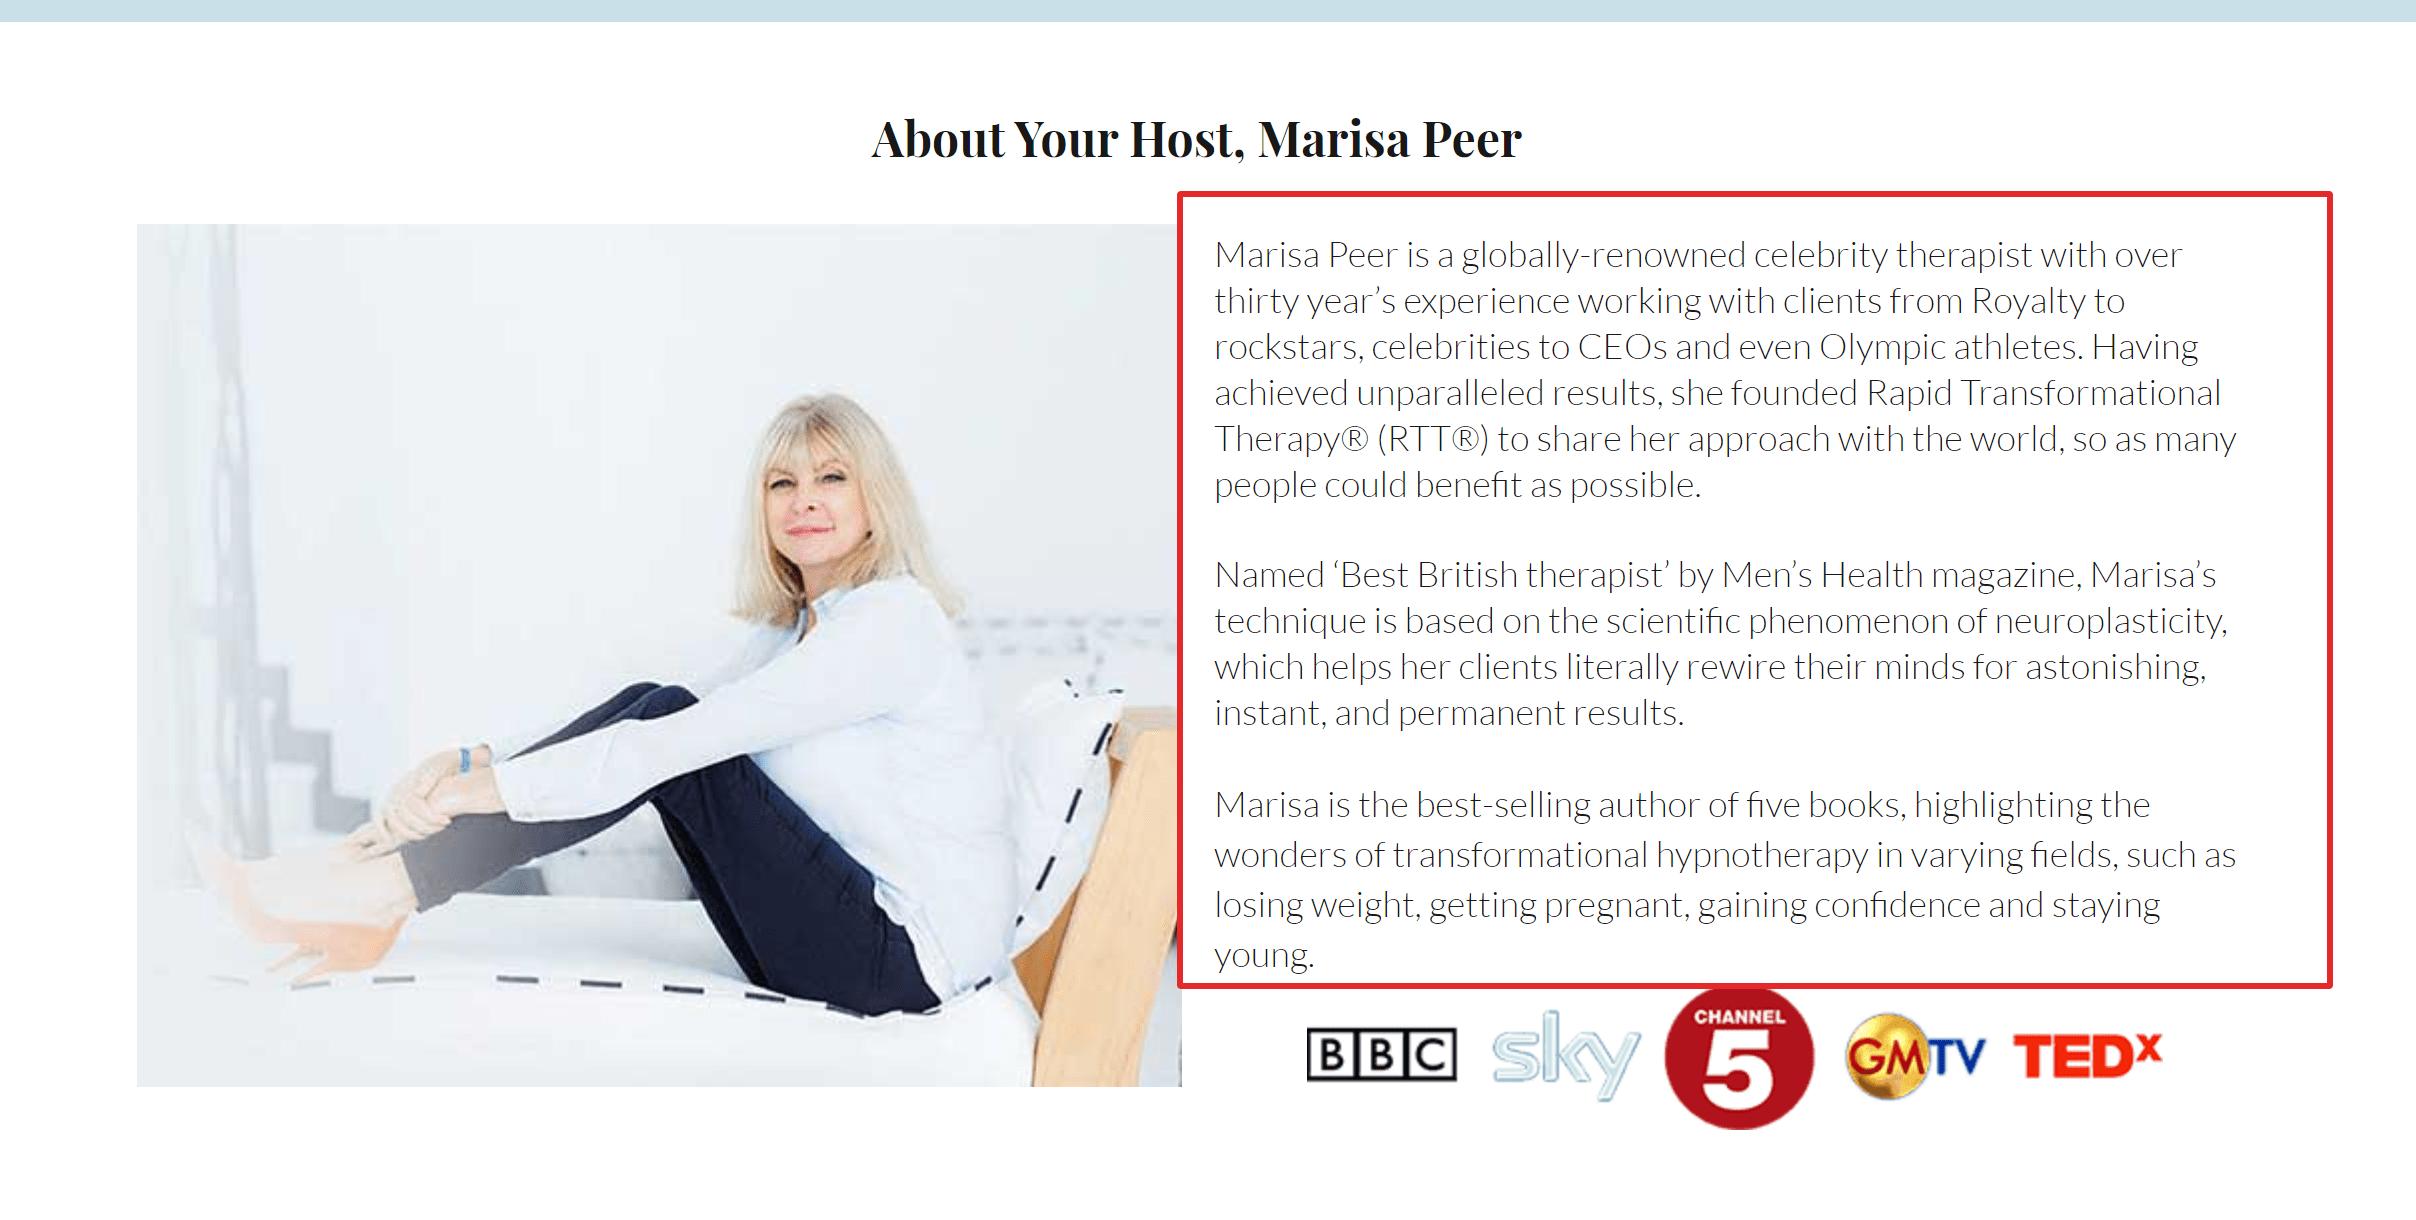 Marisa Peer I am Enough Course Reviews